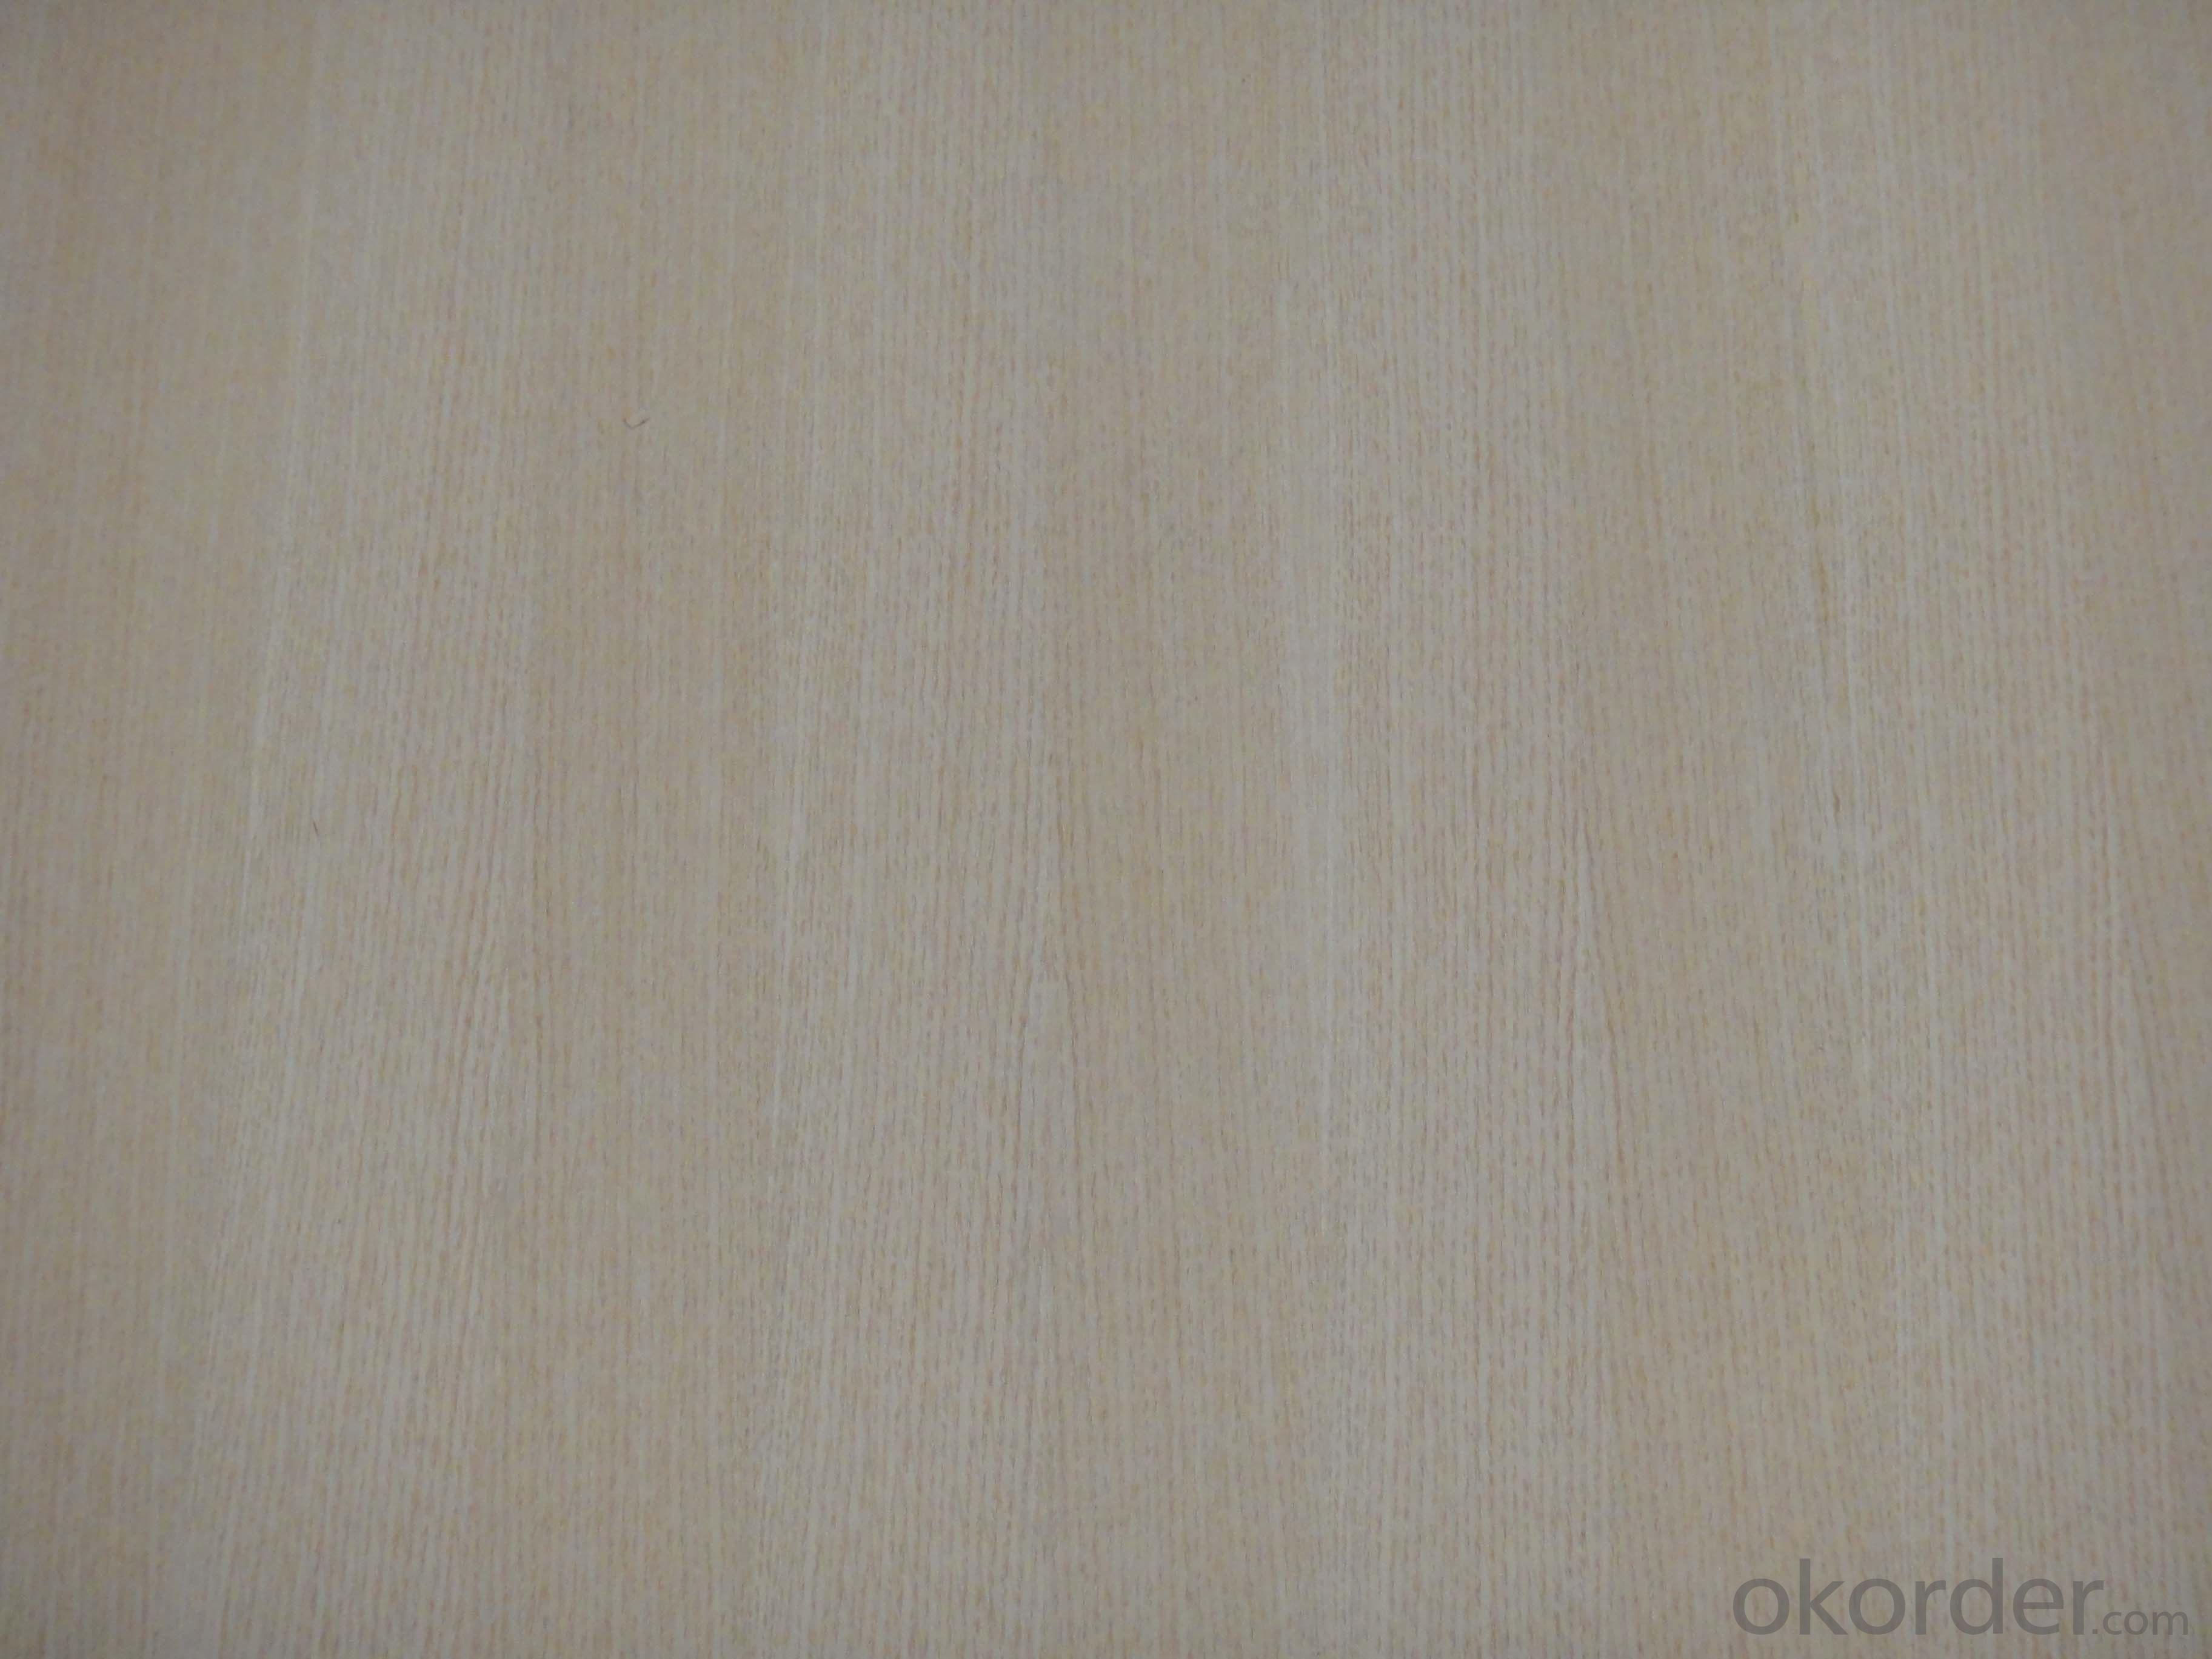 Real White Oak Veneered MDF Boards